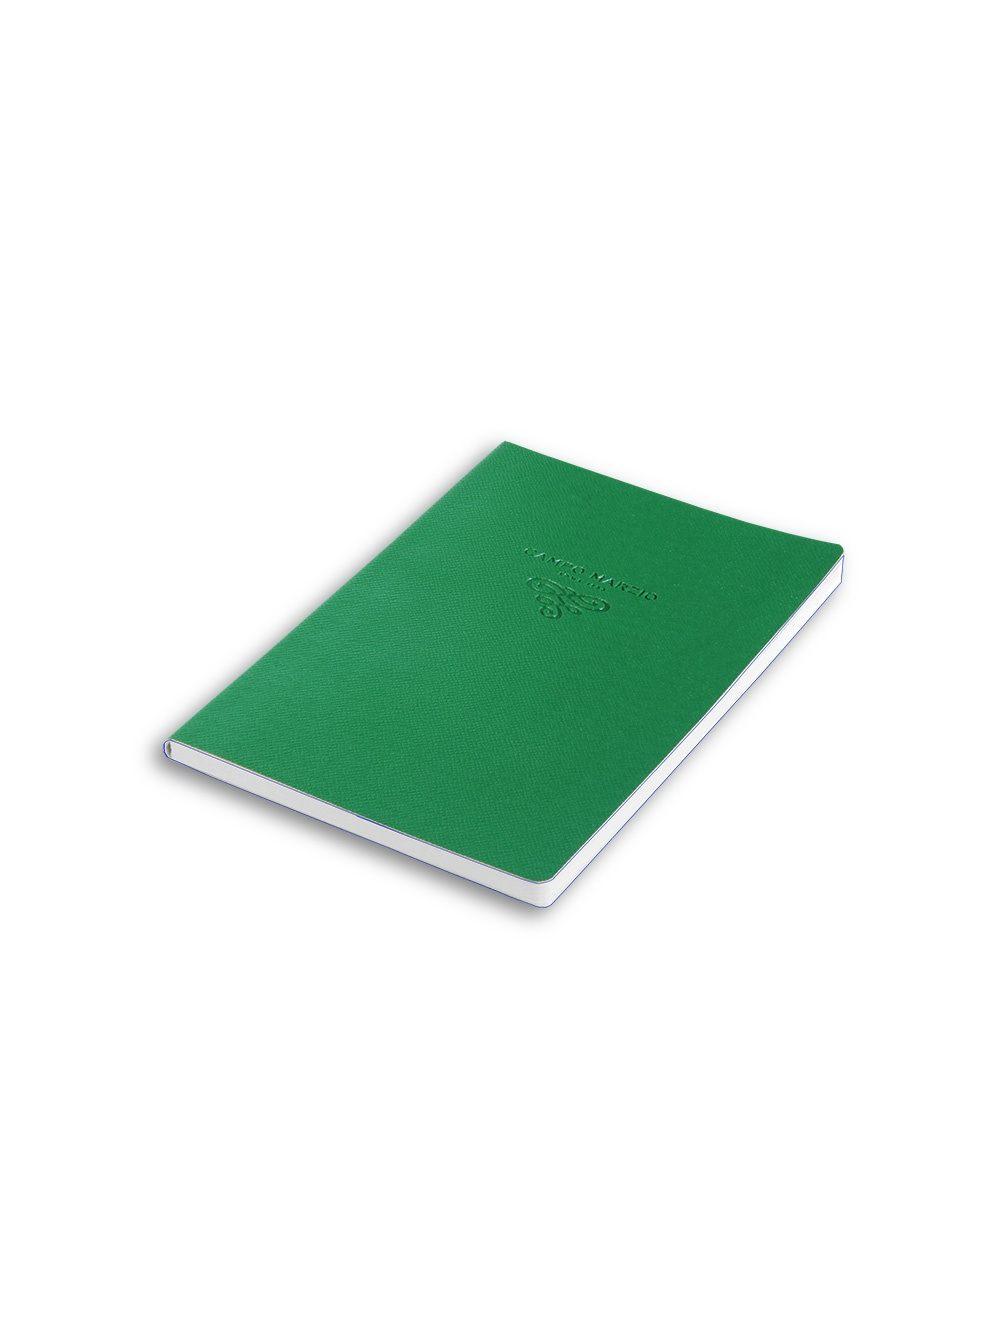 Journal 11x16 cm - White Internal Paper - Pine